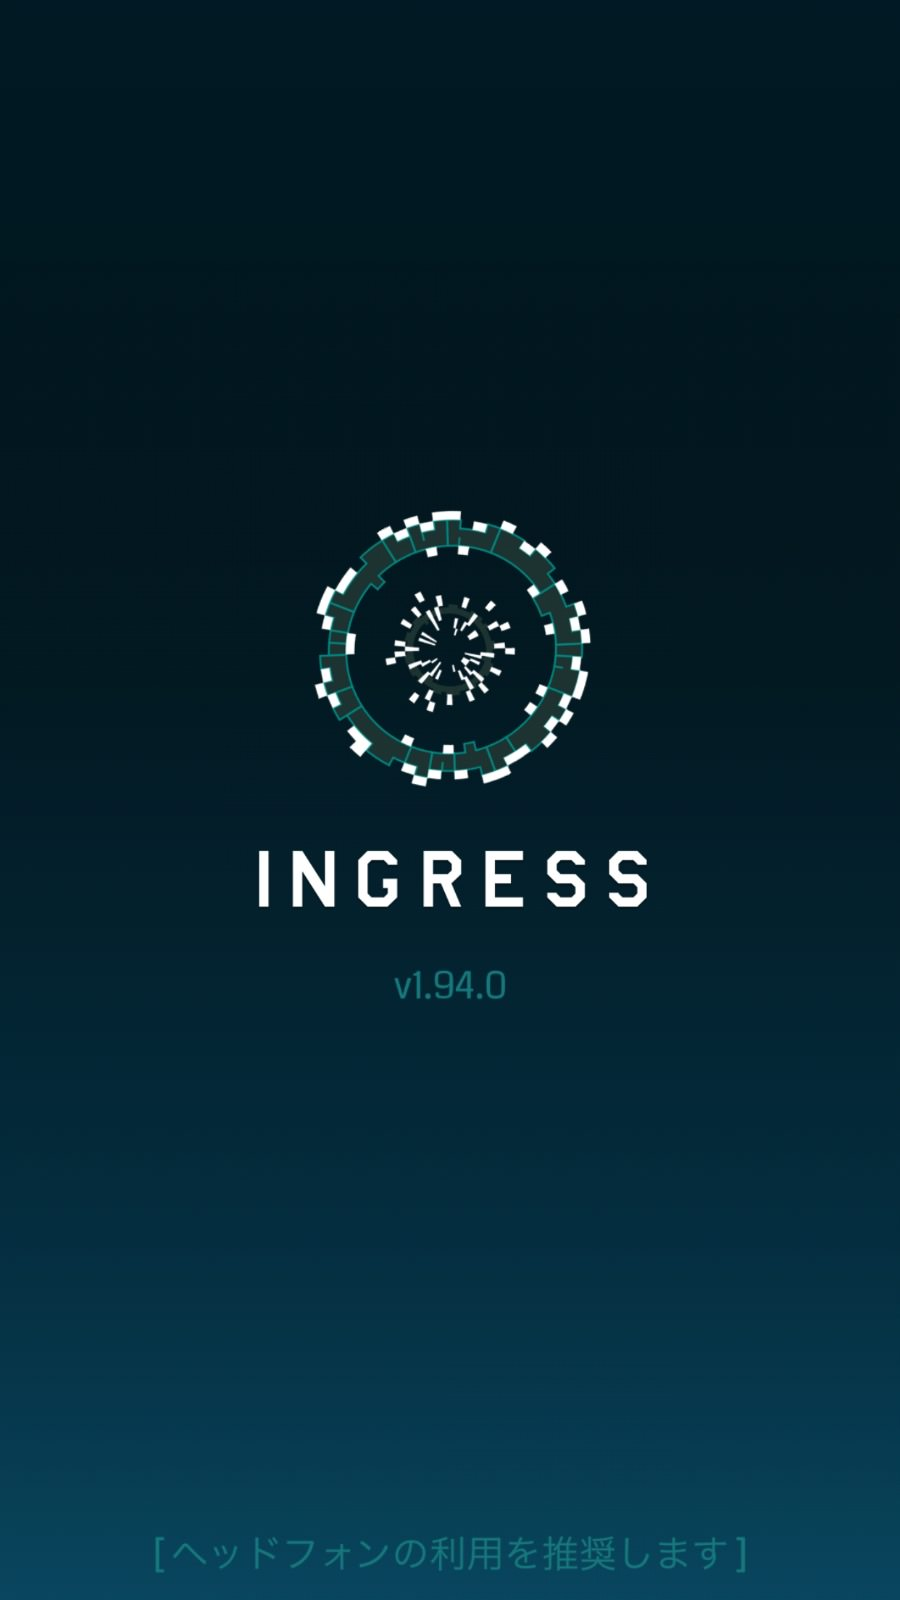 【Ingress】iOS版「Ingress 1.94.0」リリース → パワーキューブがリサイクルでも使用時のXMが得られるように